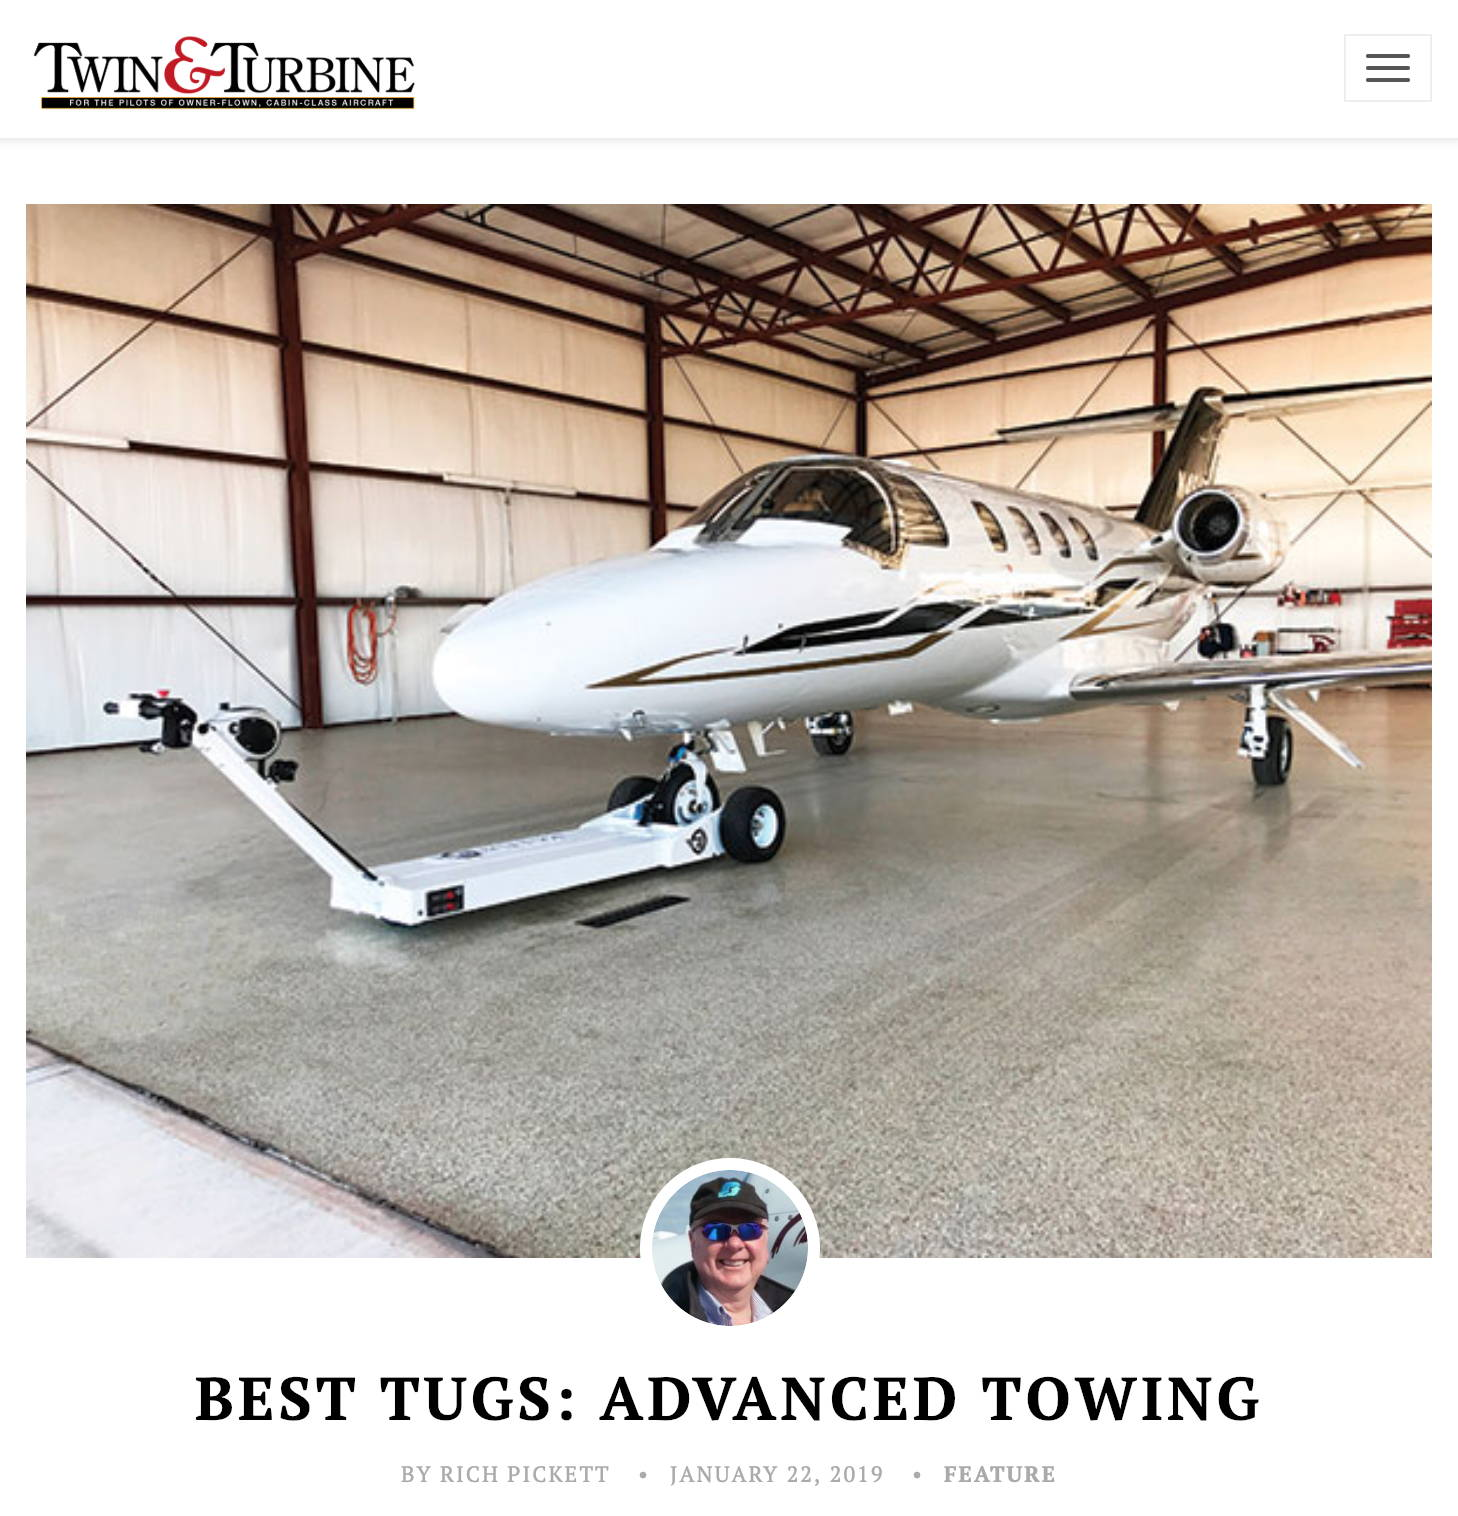 News – Best Tugs